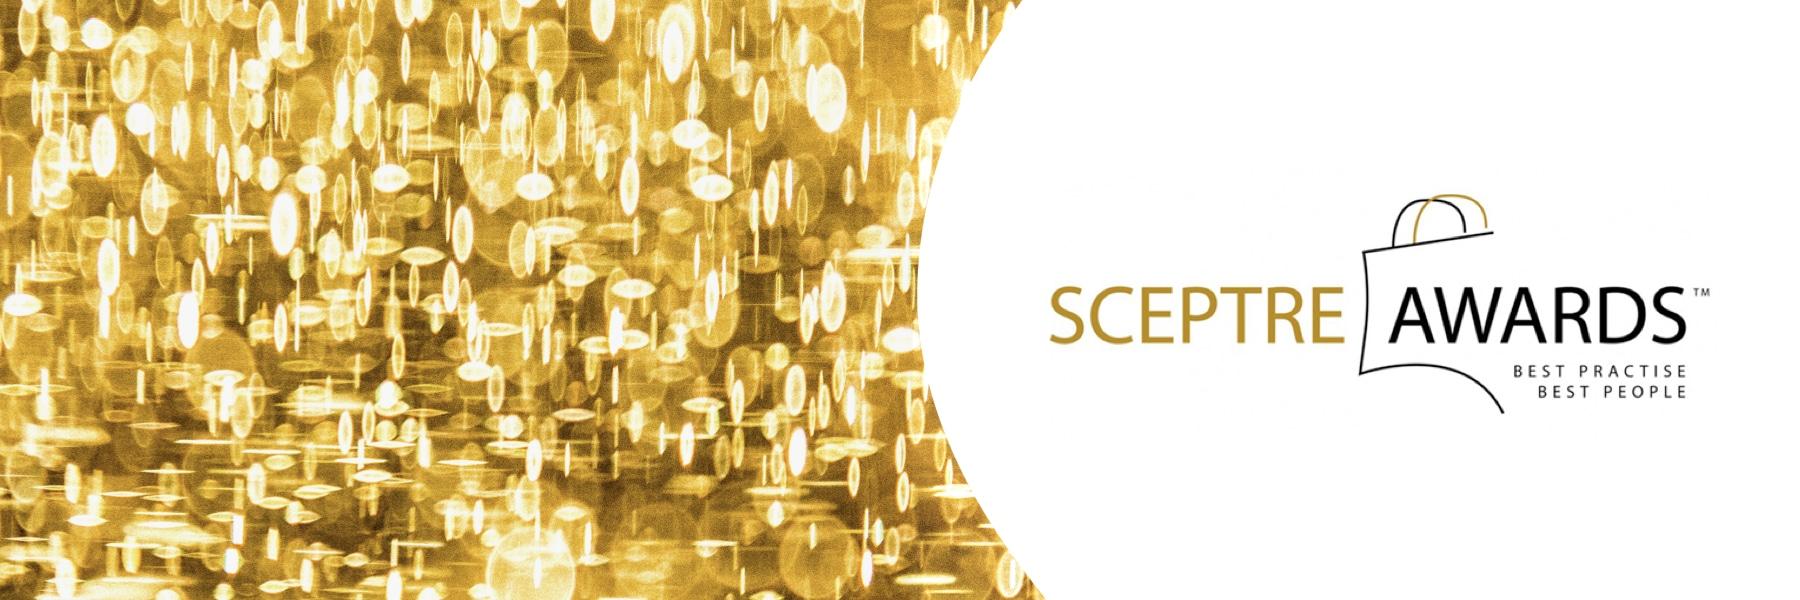 Sceptre Award Win!